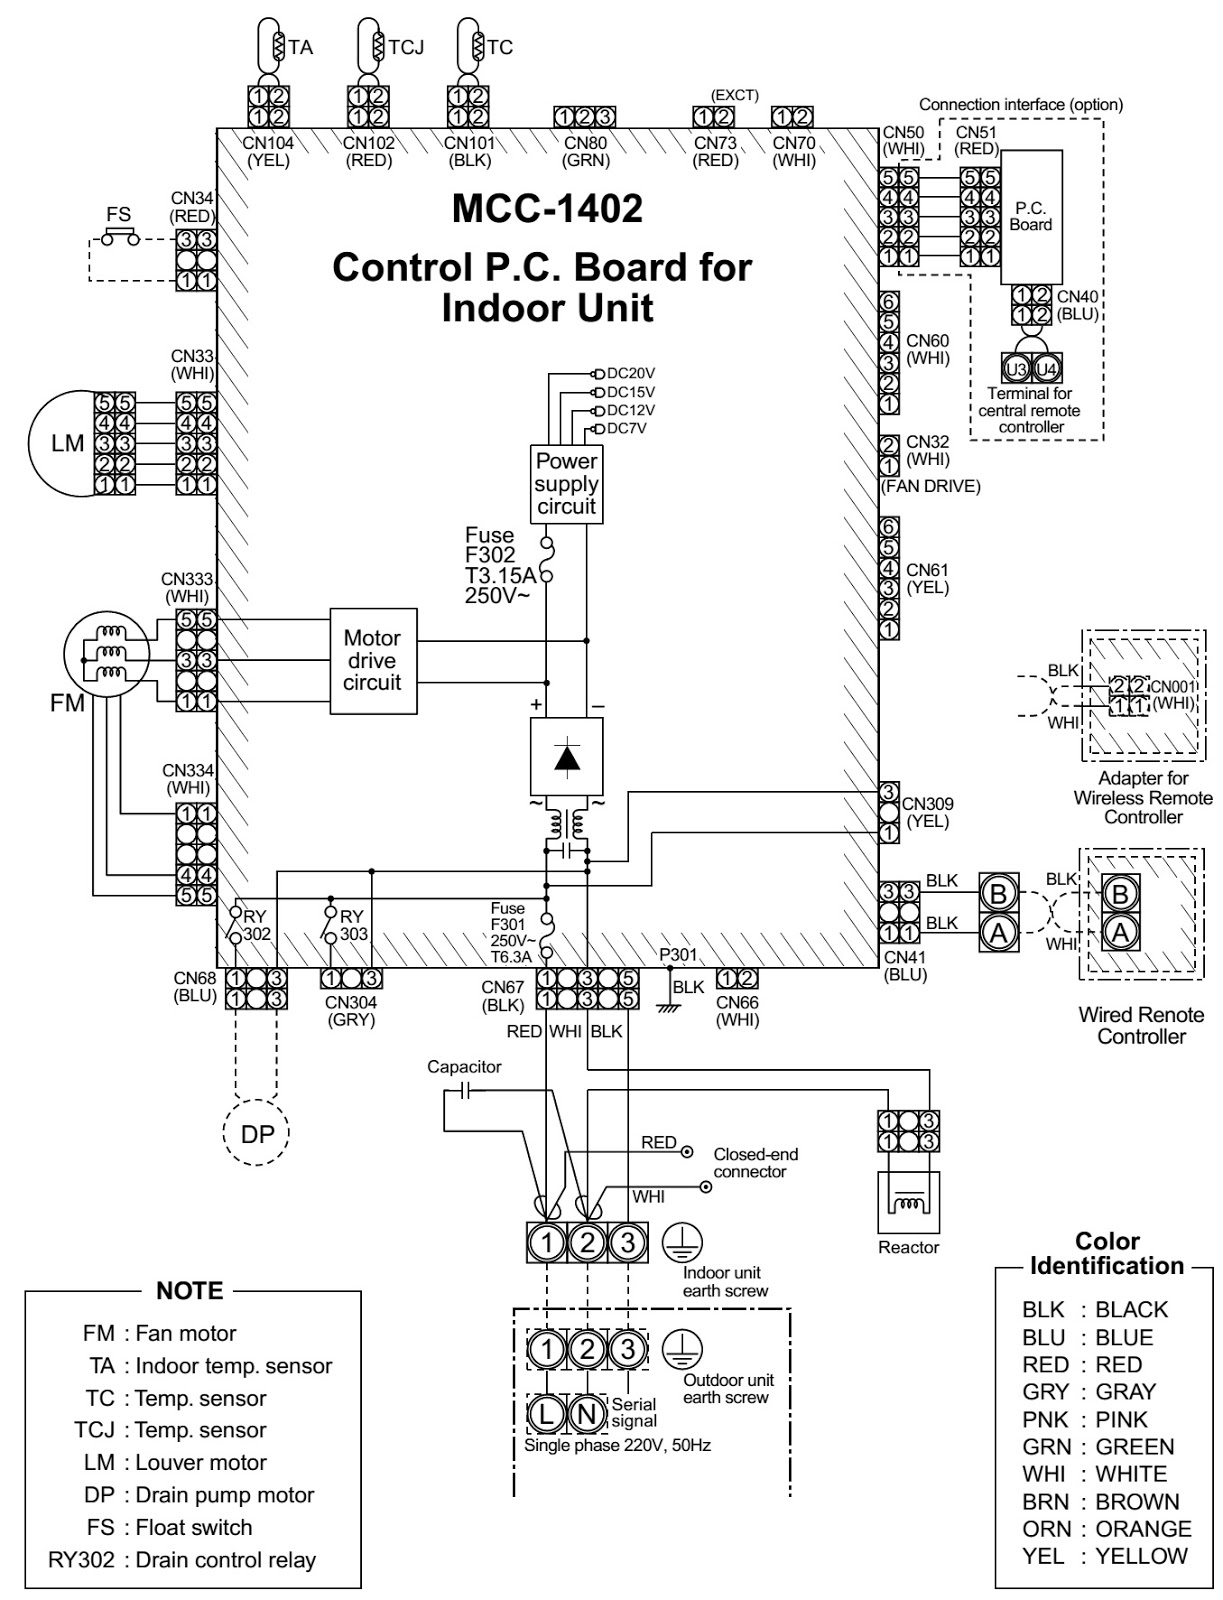 hight resolution of toshiba air conditioner wiring diagram toshiba airconditioners split type wiring diagram digital inverter